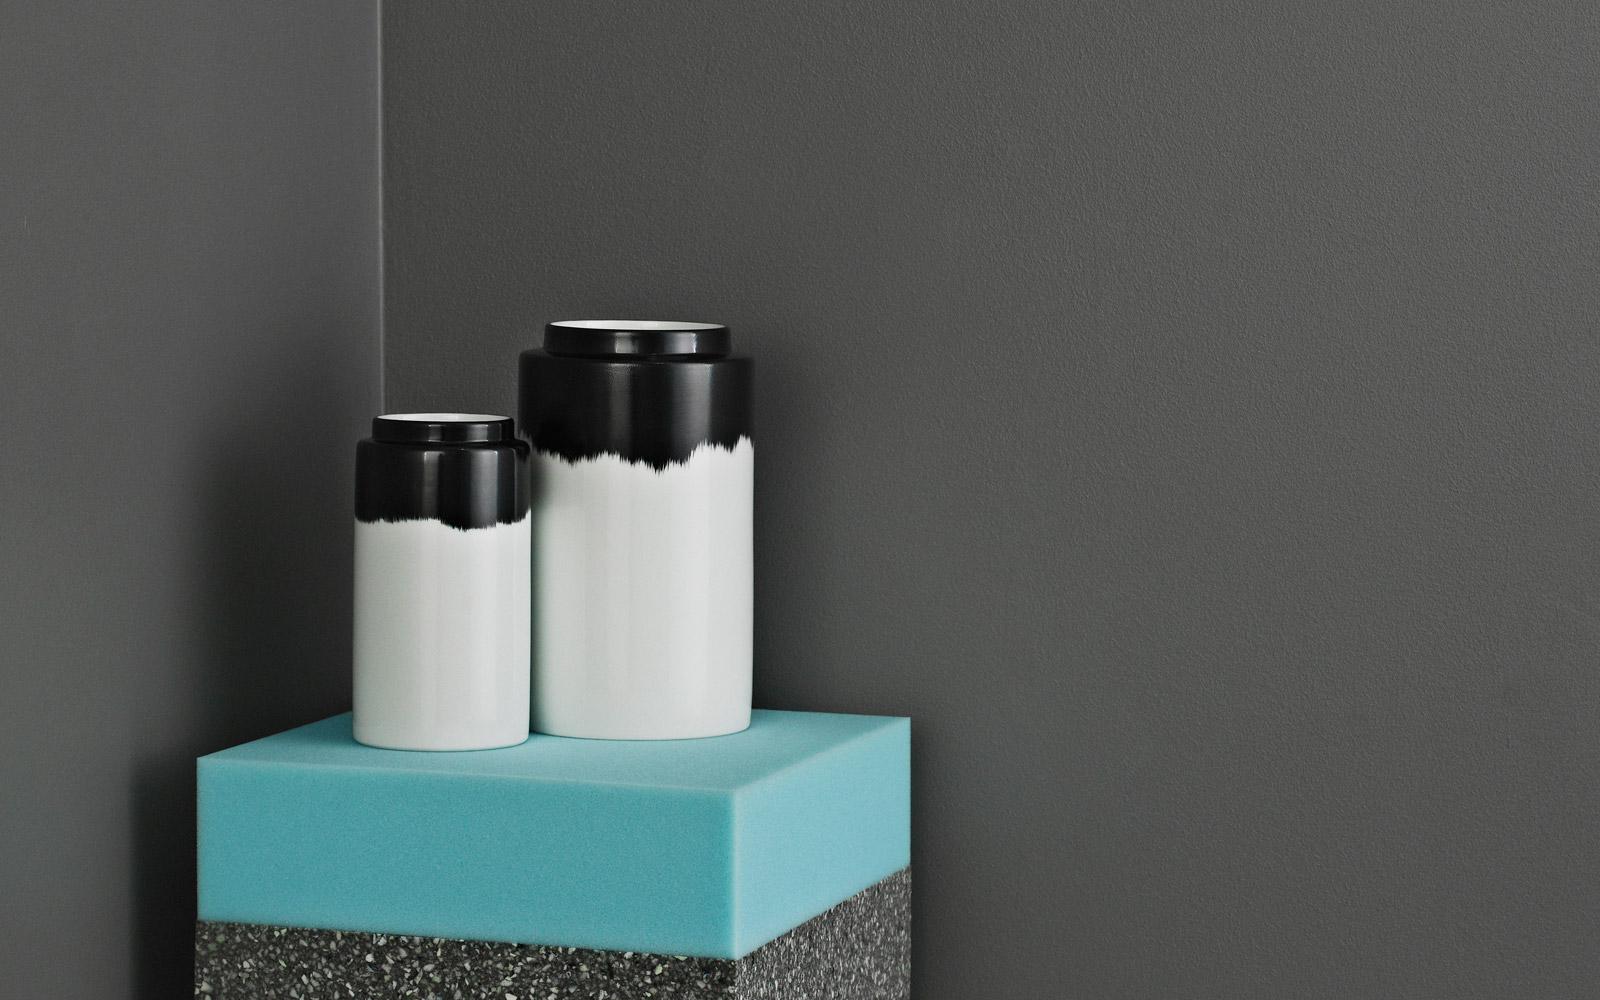 Vases-design-Agnes-Fries-Normann Copenhagen-04